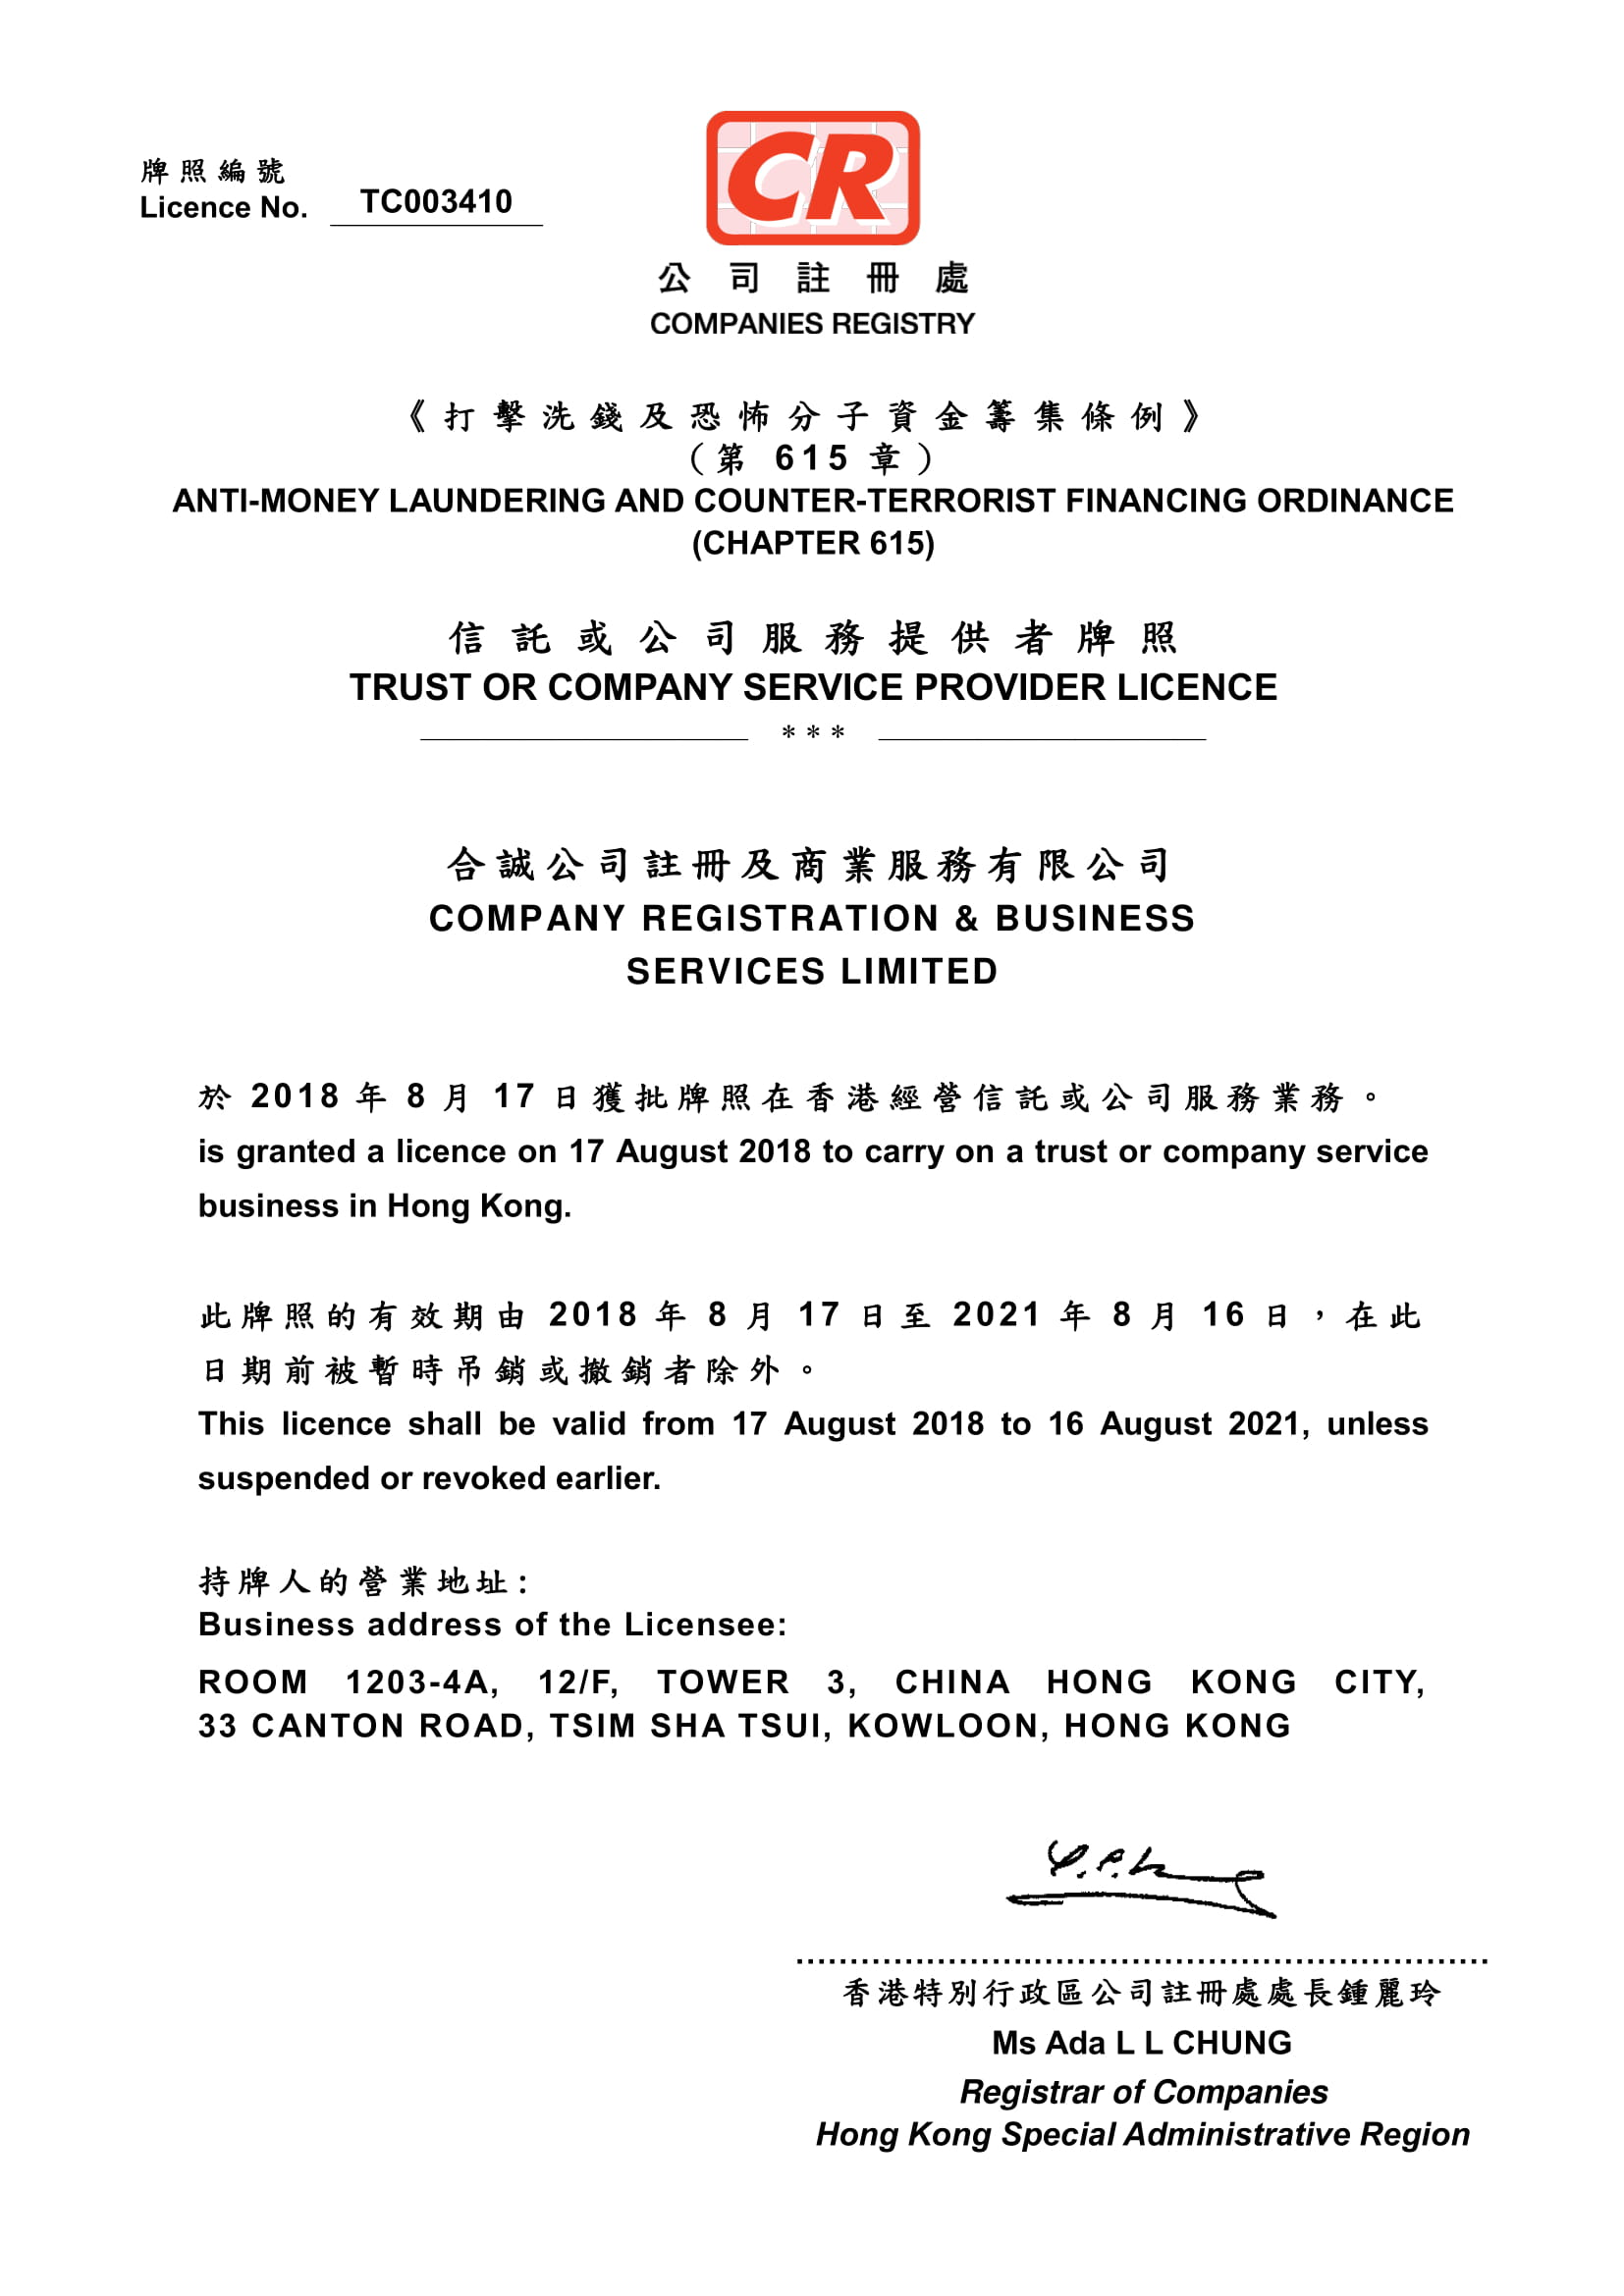 License Certificate